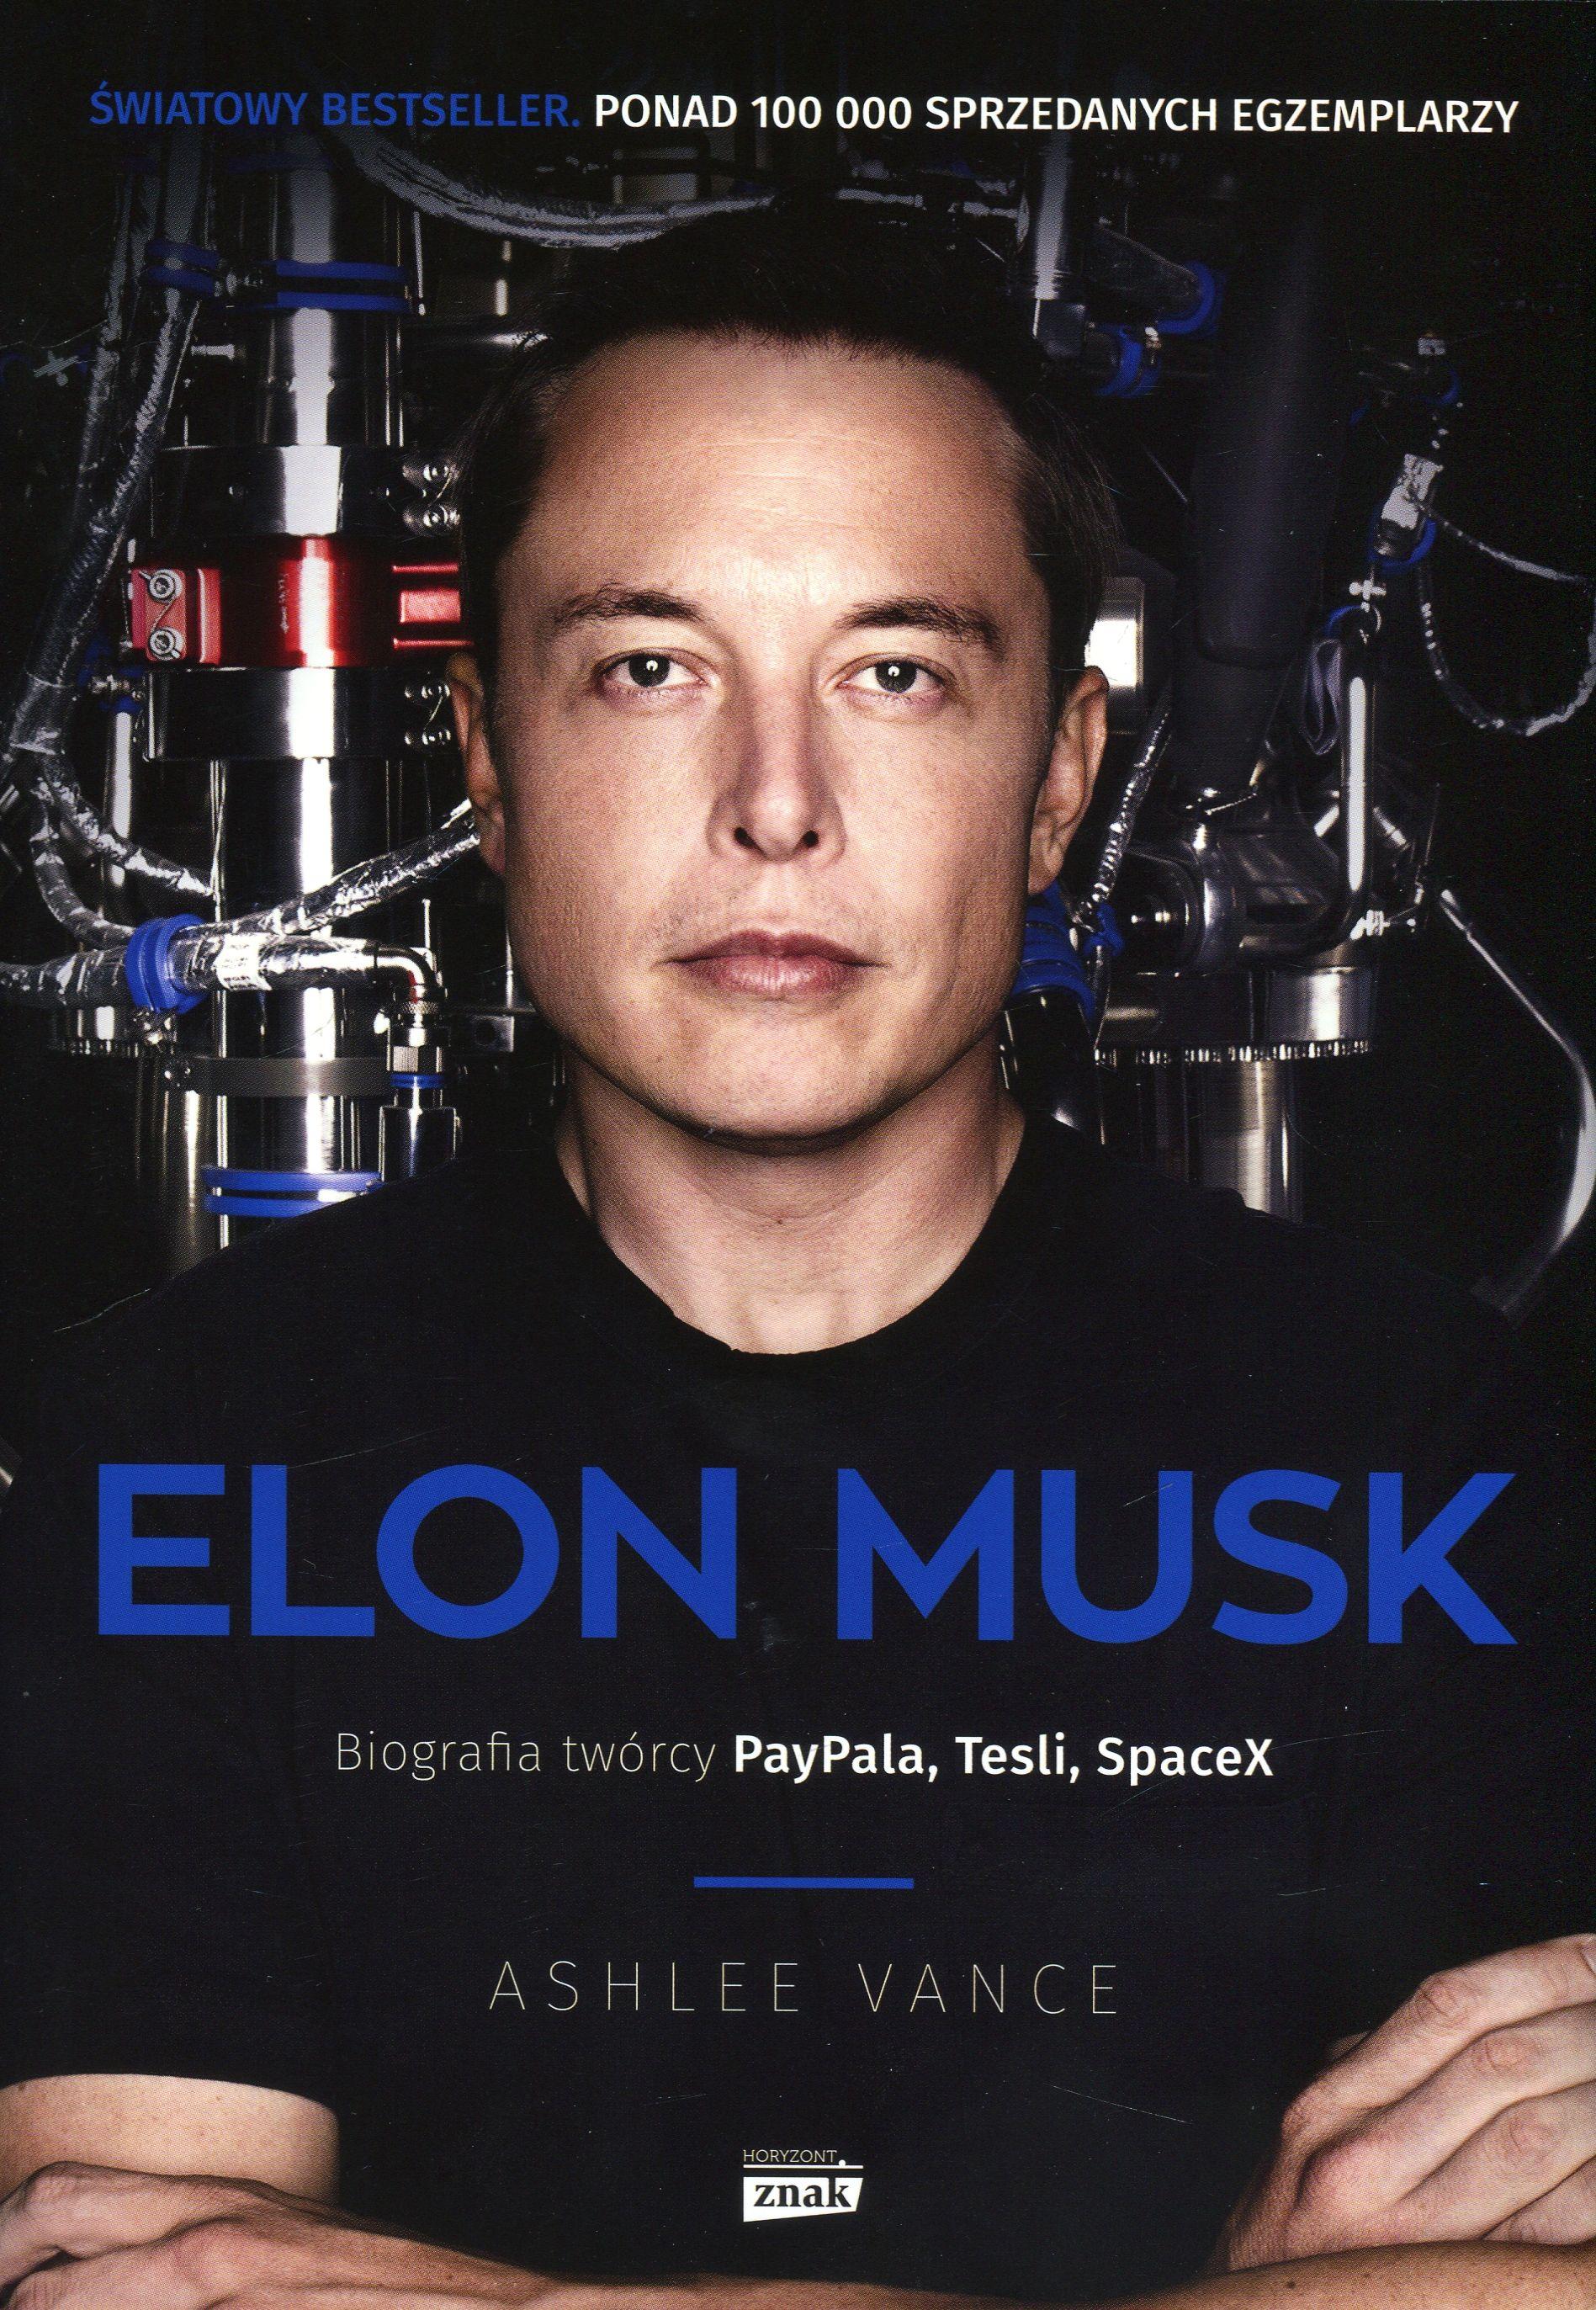 Elon Musk. Biografia twórcy PayPala, Tesli, SpaceX